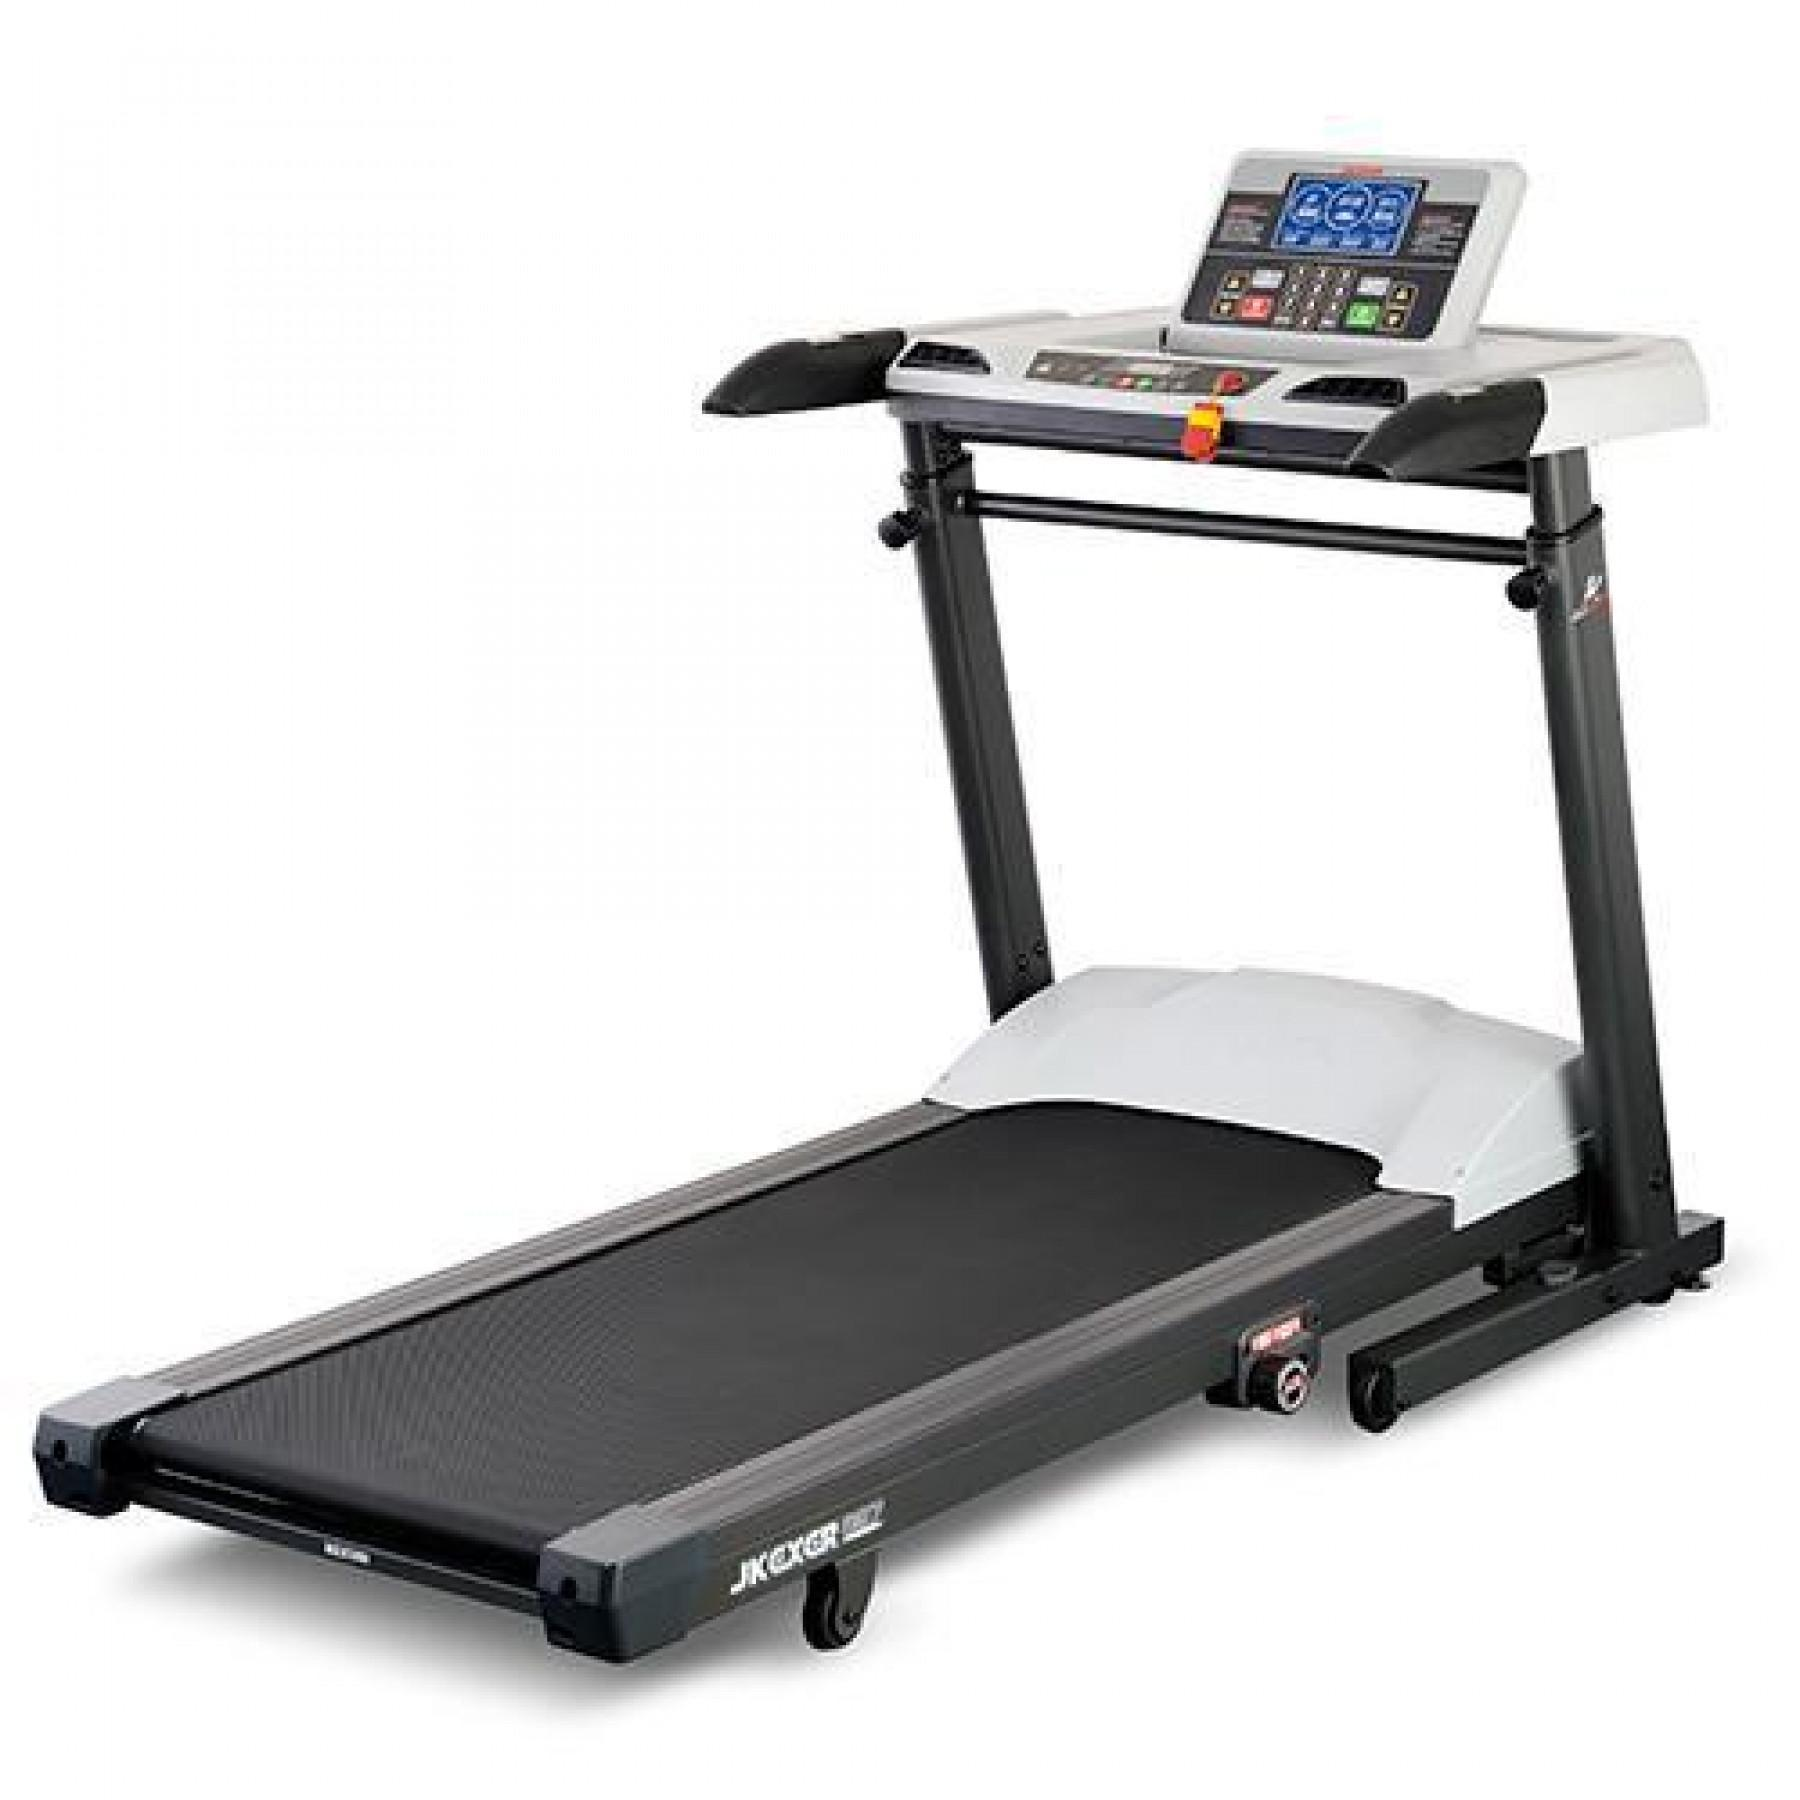 Aero Work Treadmill Treadmill Desk Evo Cardio